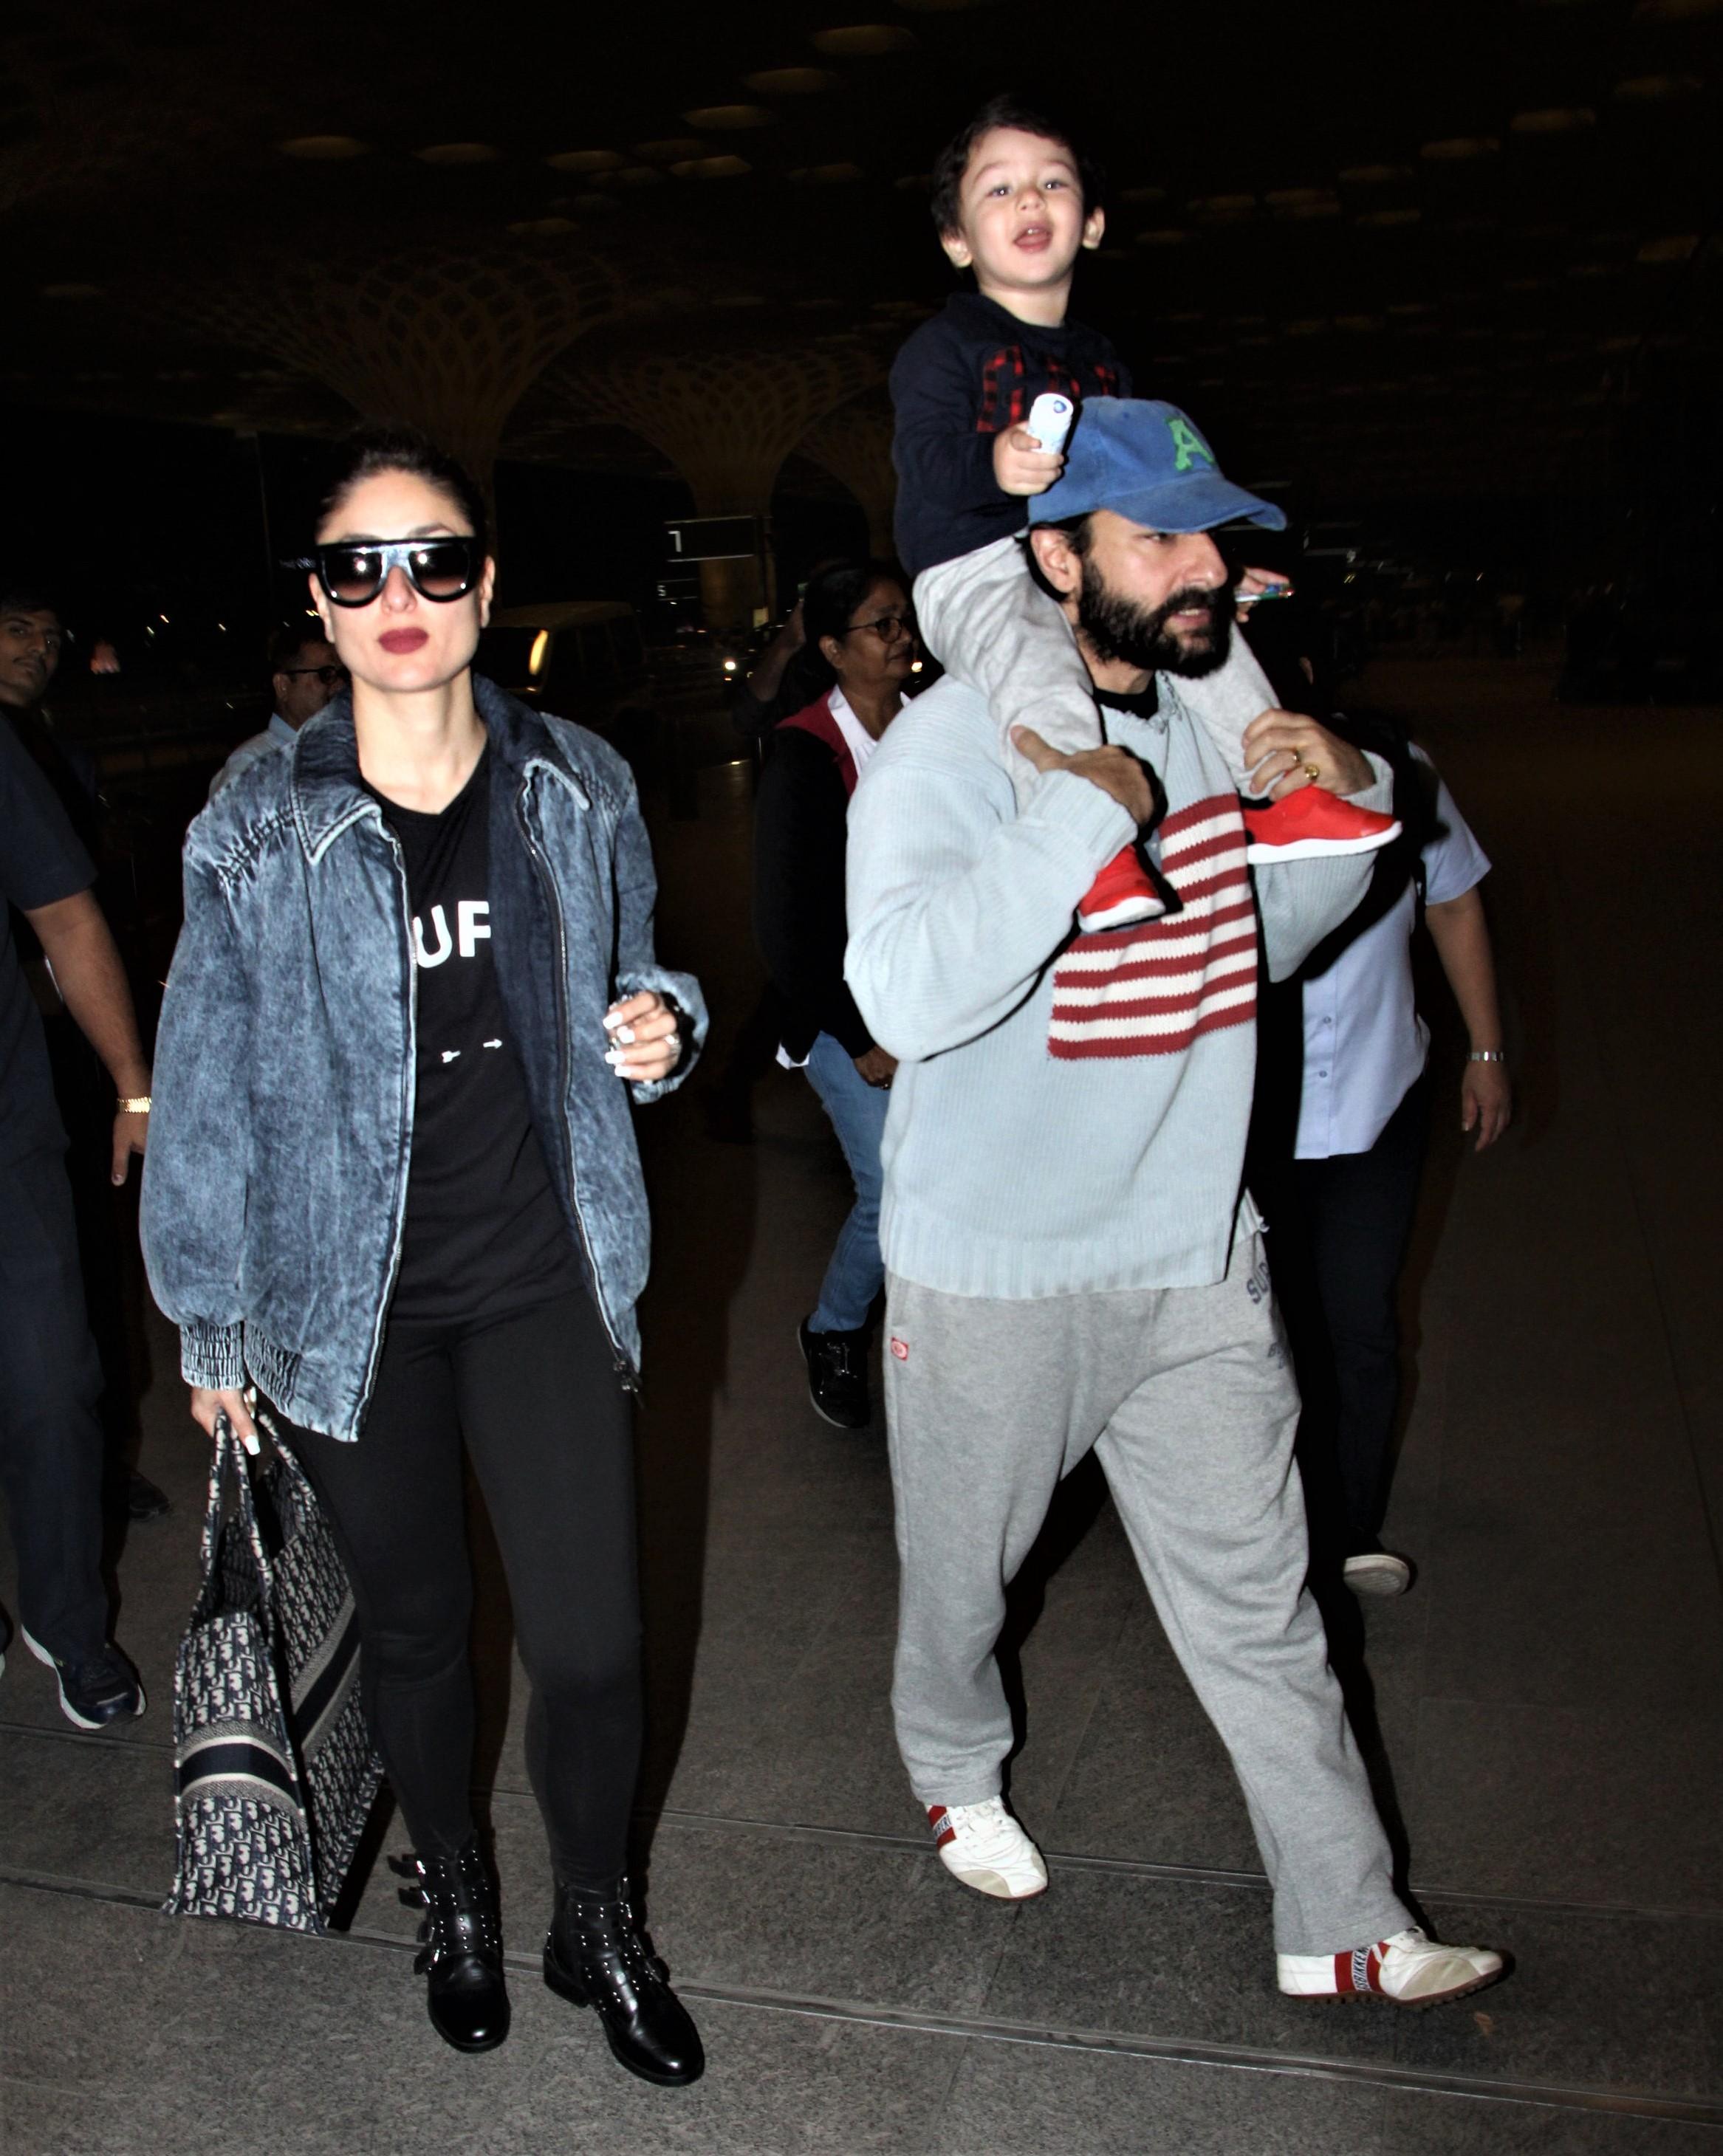 Airport Diaries: The Pataudi Family Make For A Stylish Appearance, Rajkummar Rao and Anushka Sharma Keep It Simple But Nail The Airport Look!